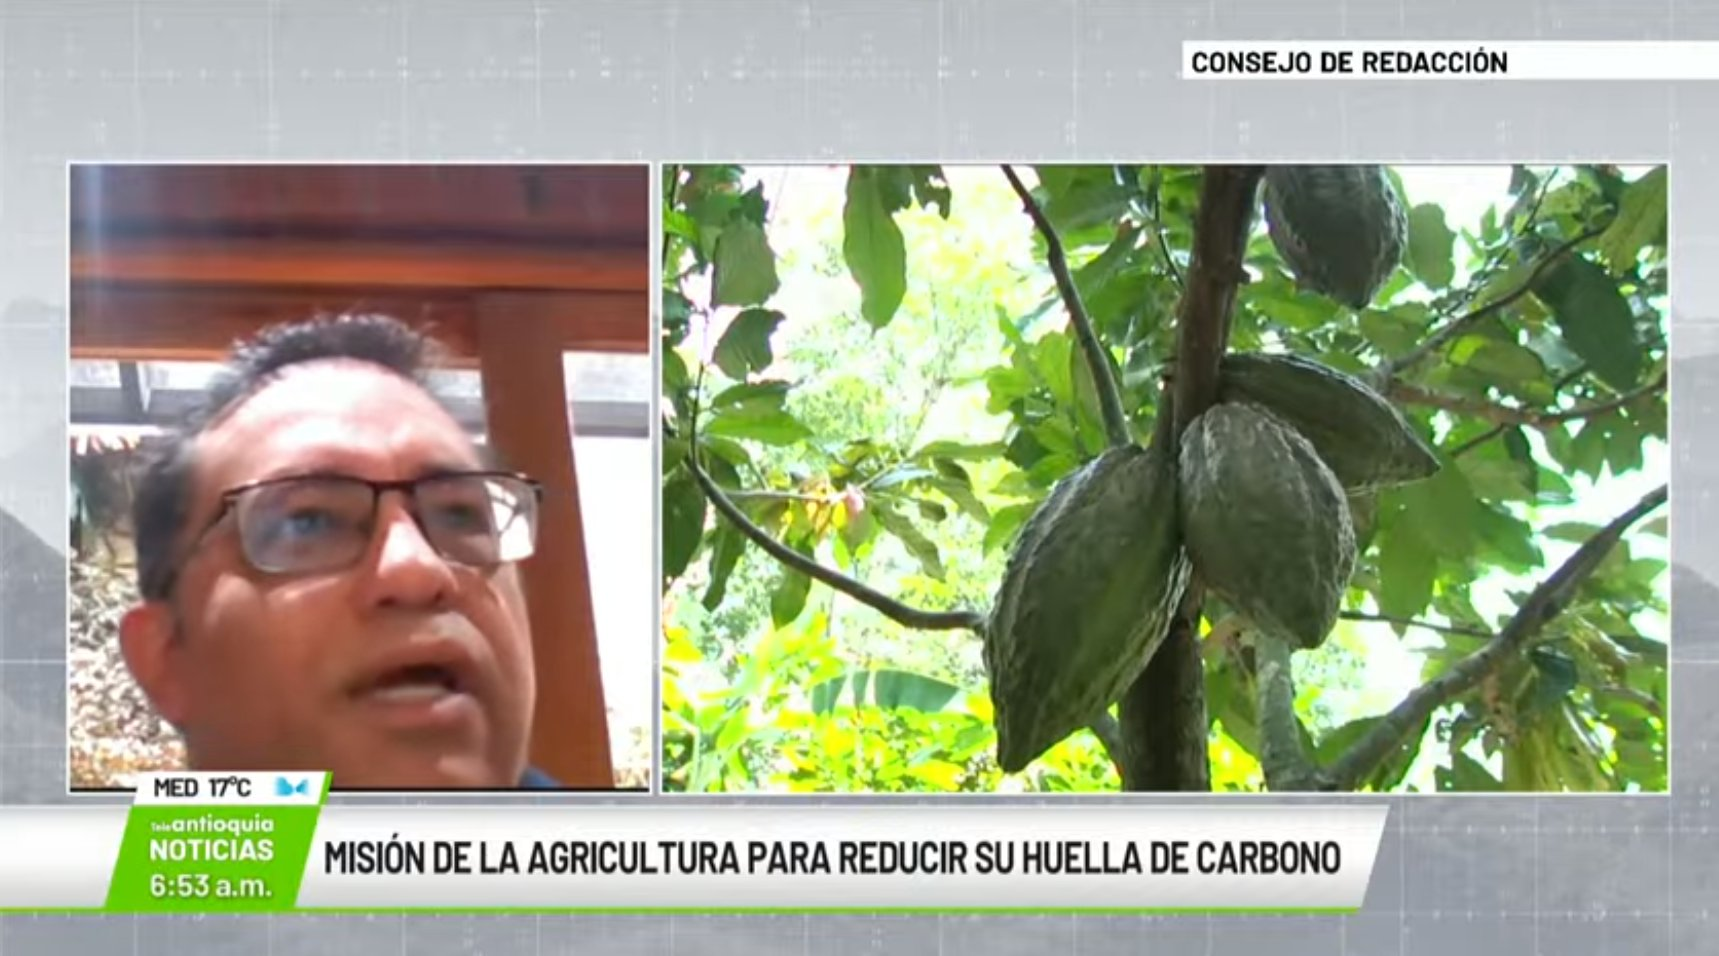 Entrevista con Rolando Barahona Rosales, experto en agricultura